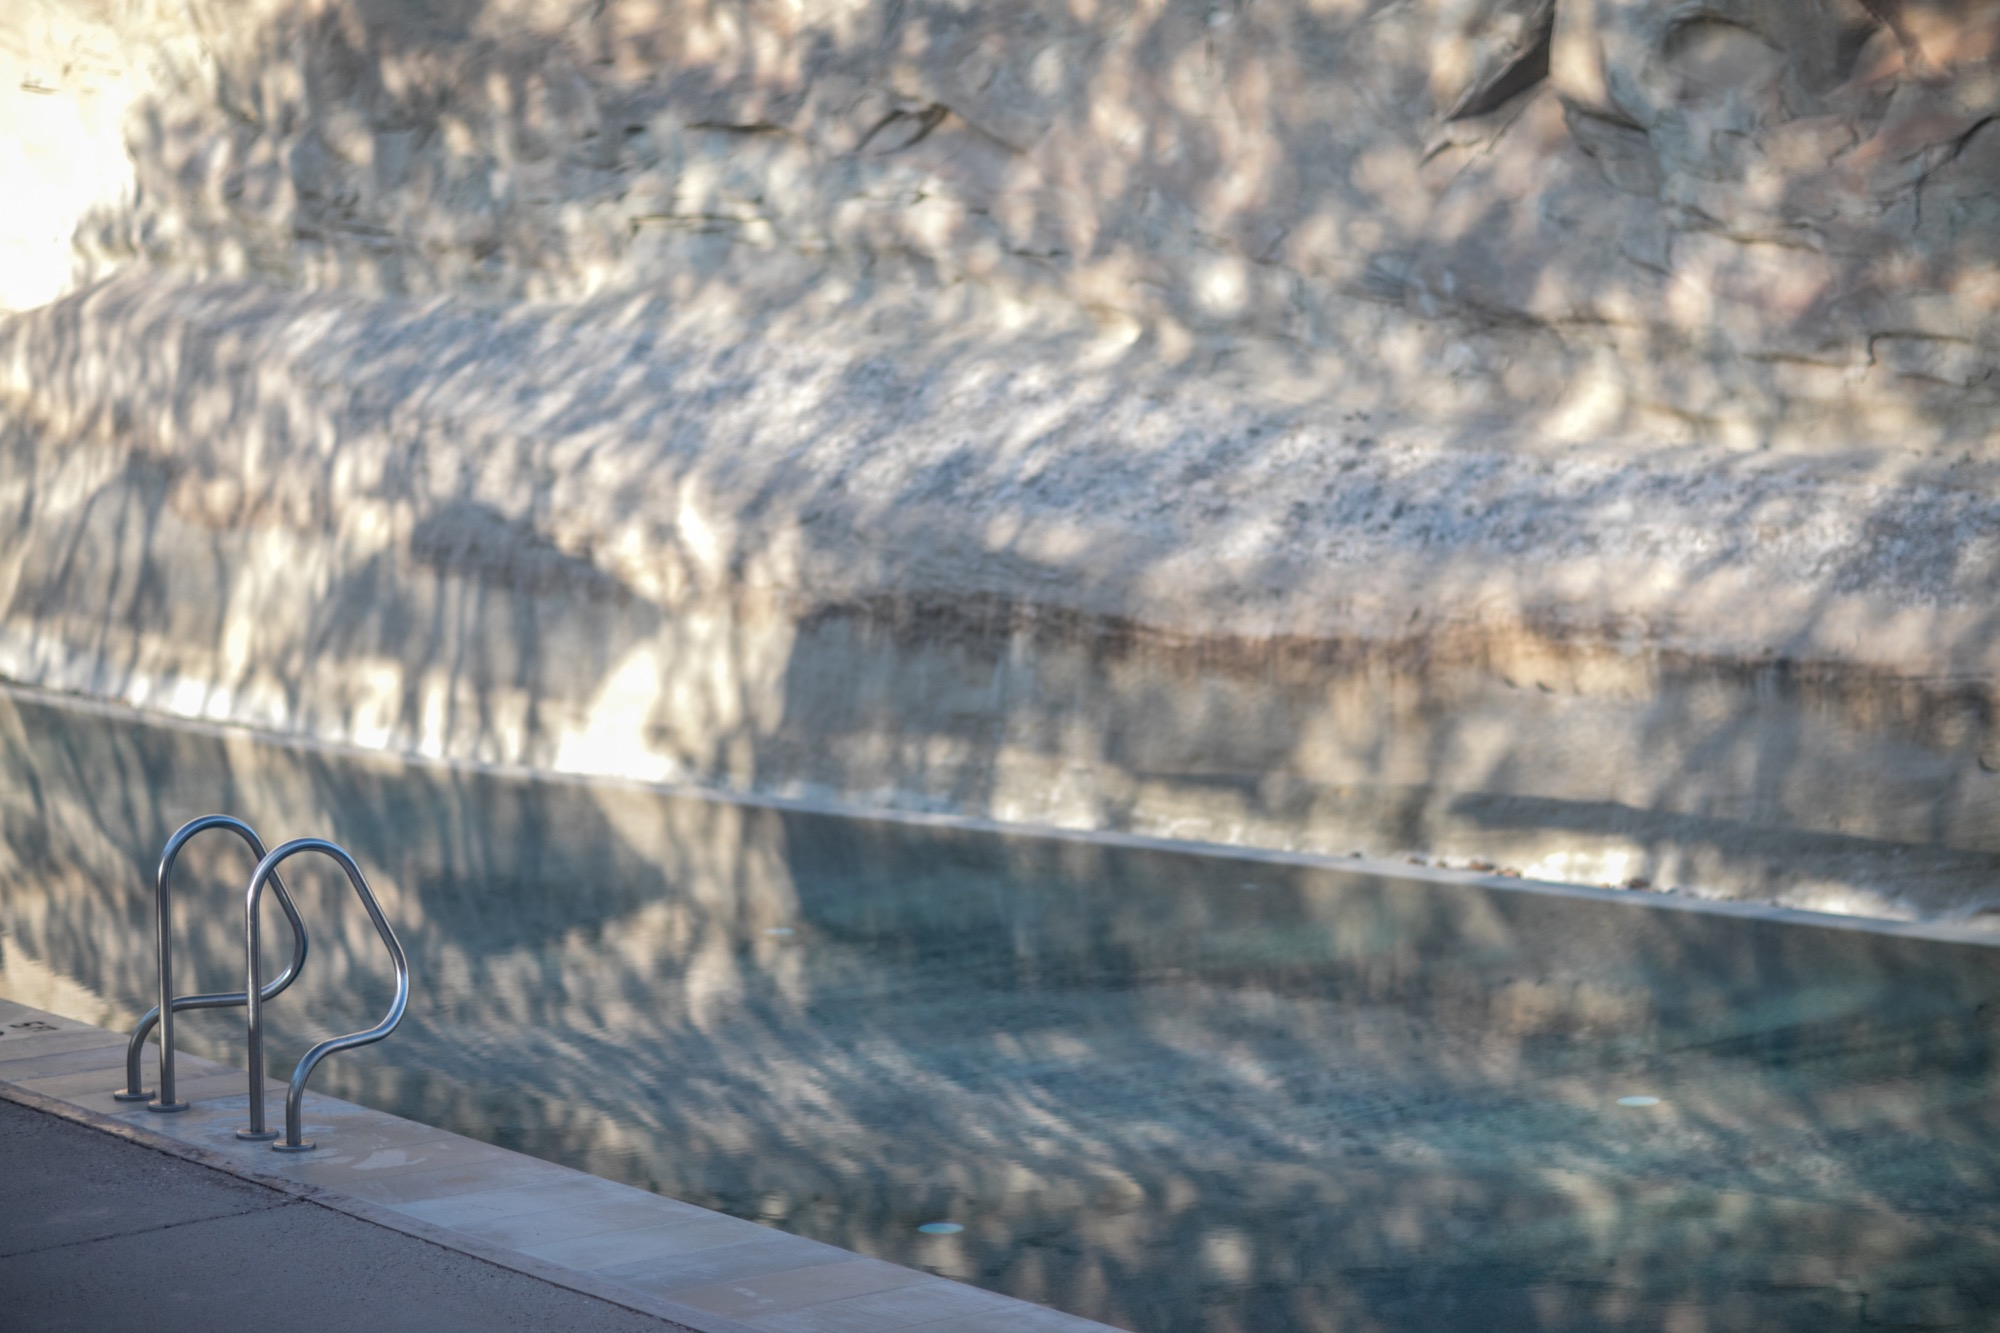 Pool at Amangiri Spa / Photo by Jake Weisz